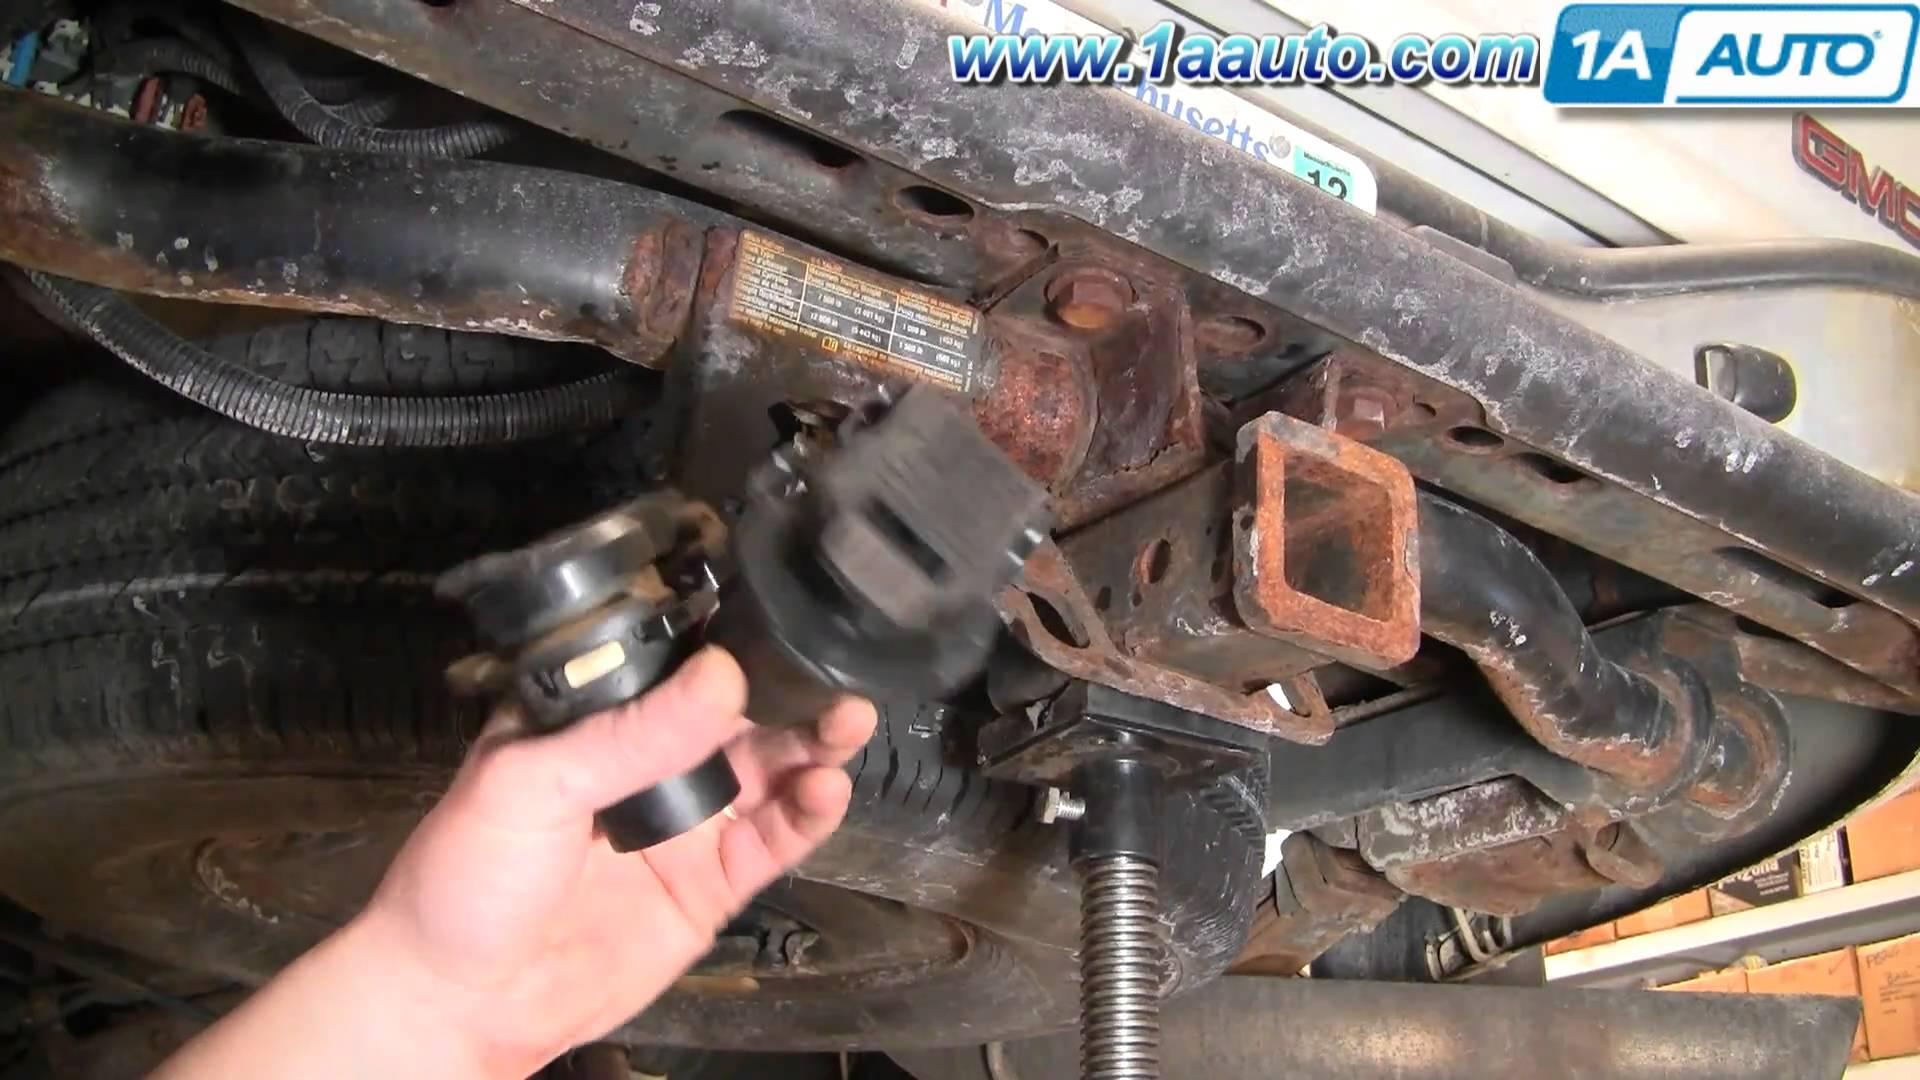 02 Chevy Trailblazer Engine Wiring Harness | Wiring Library - 7 Pin Trailer Connector Wiring Diagram